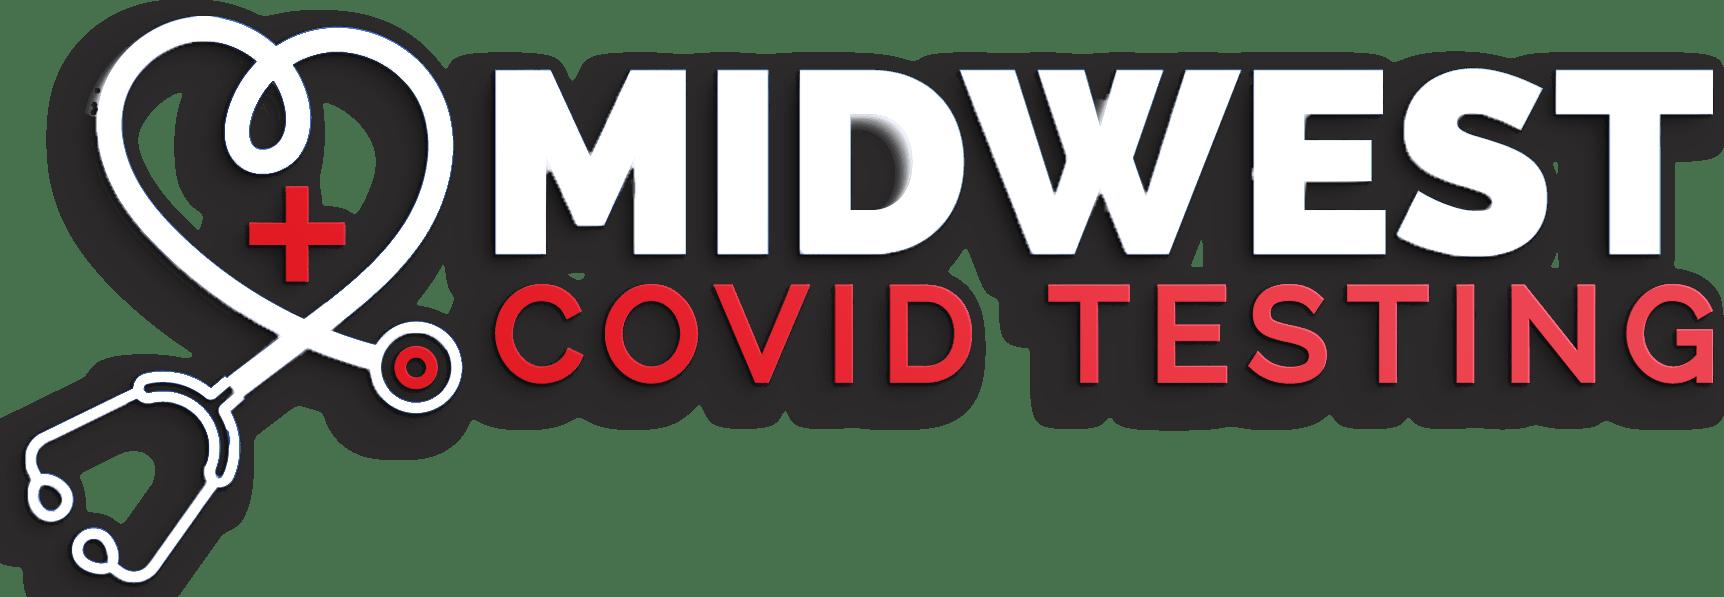 Midwest Covid Testing | Rapid & PCR Test | Free Covid Testing Midwest Covid Testing | Rapid Chicago Covid Testing